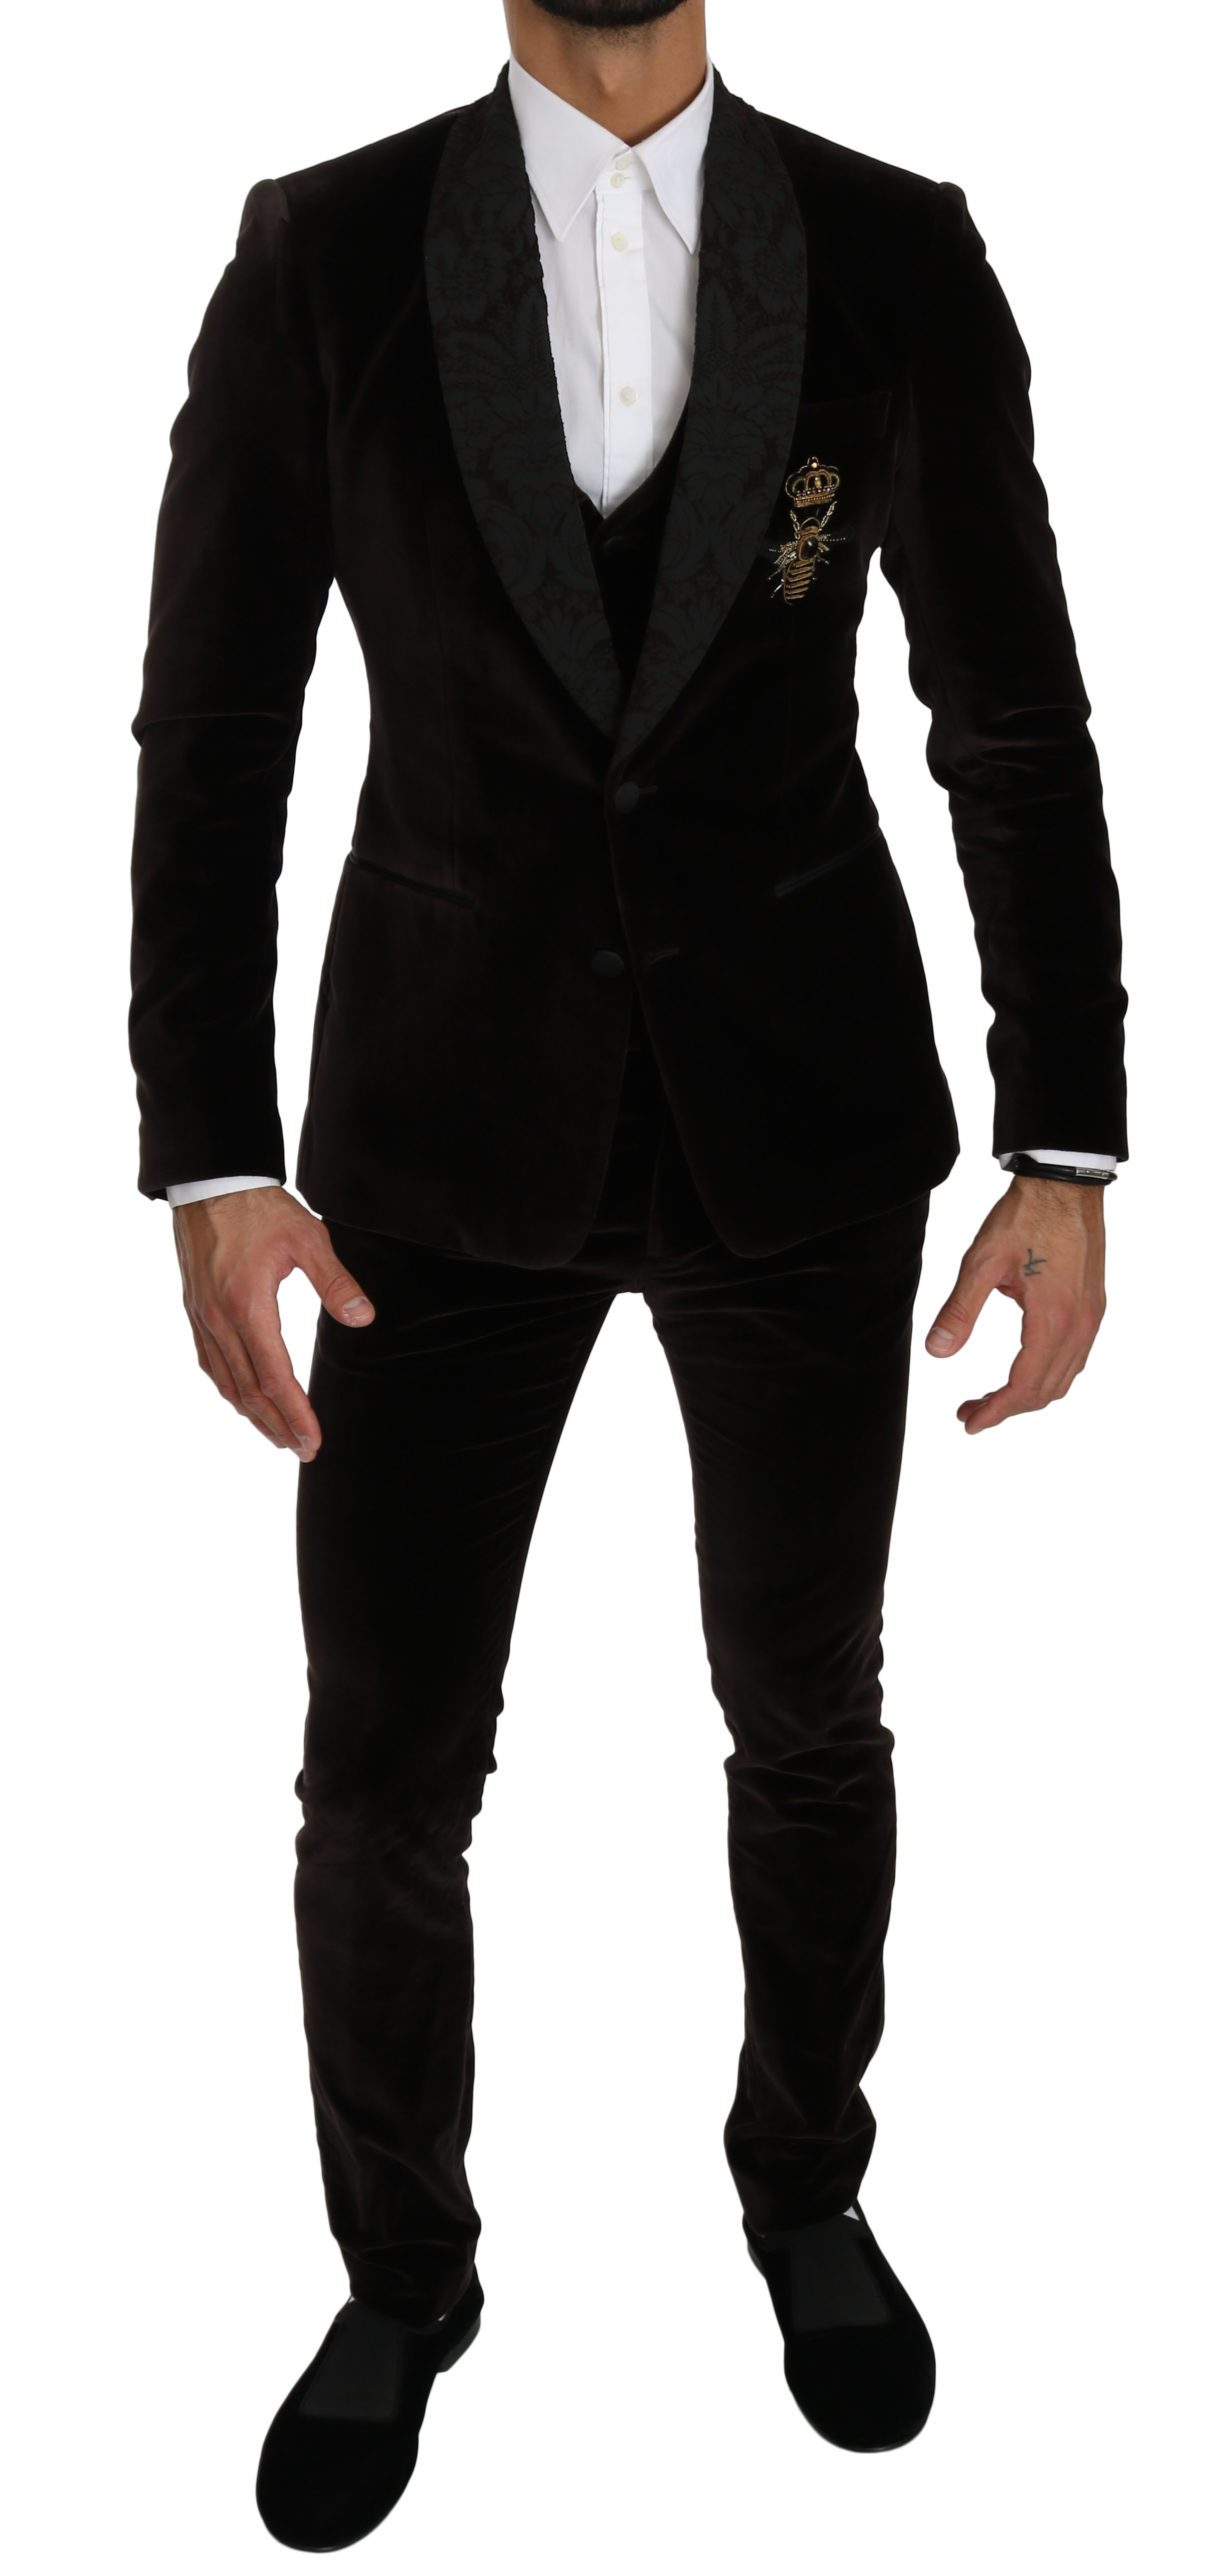 Dolce & Gabbana Men's Slim Fit Crown Bee 3 Piece Cotton Suit Brown KOS1544 - IT44   XS